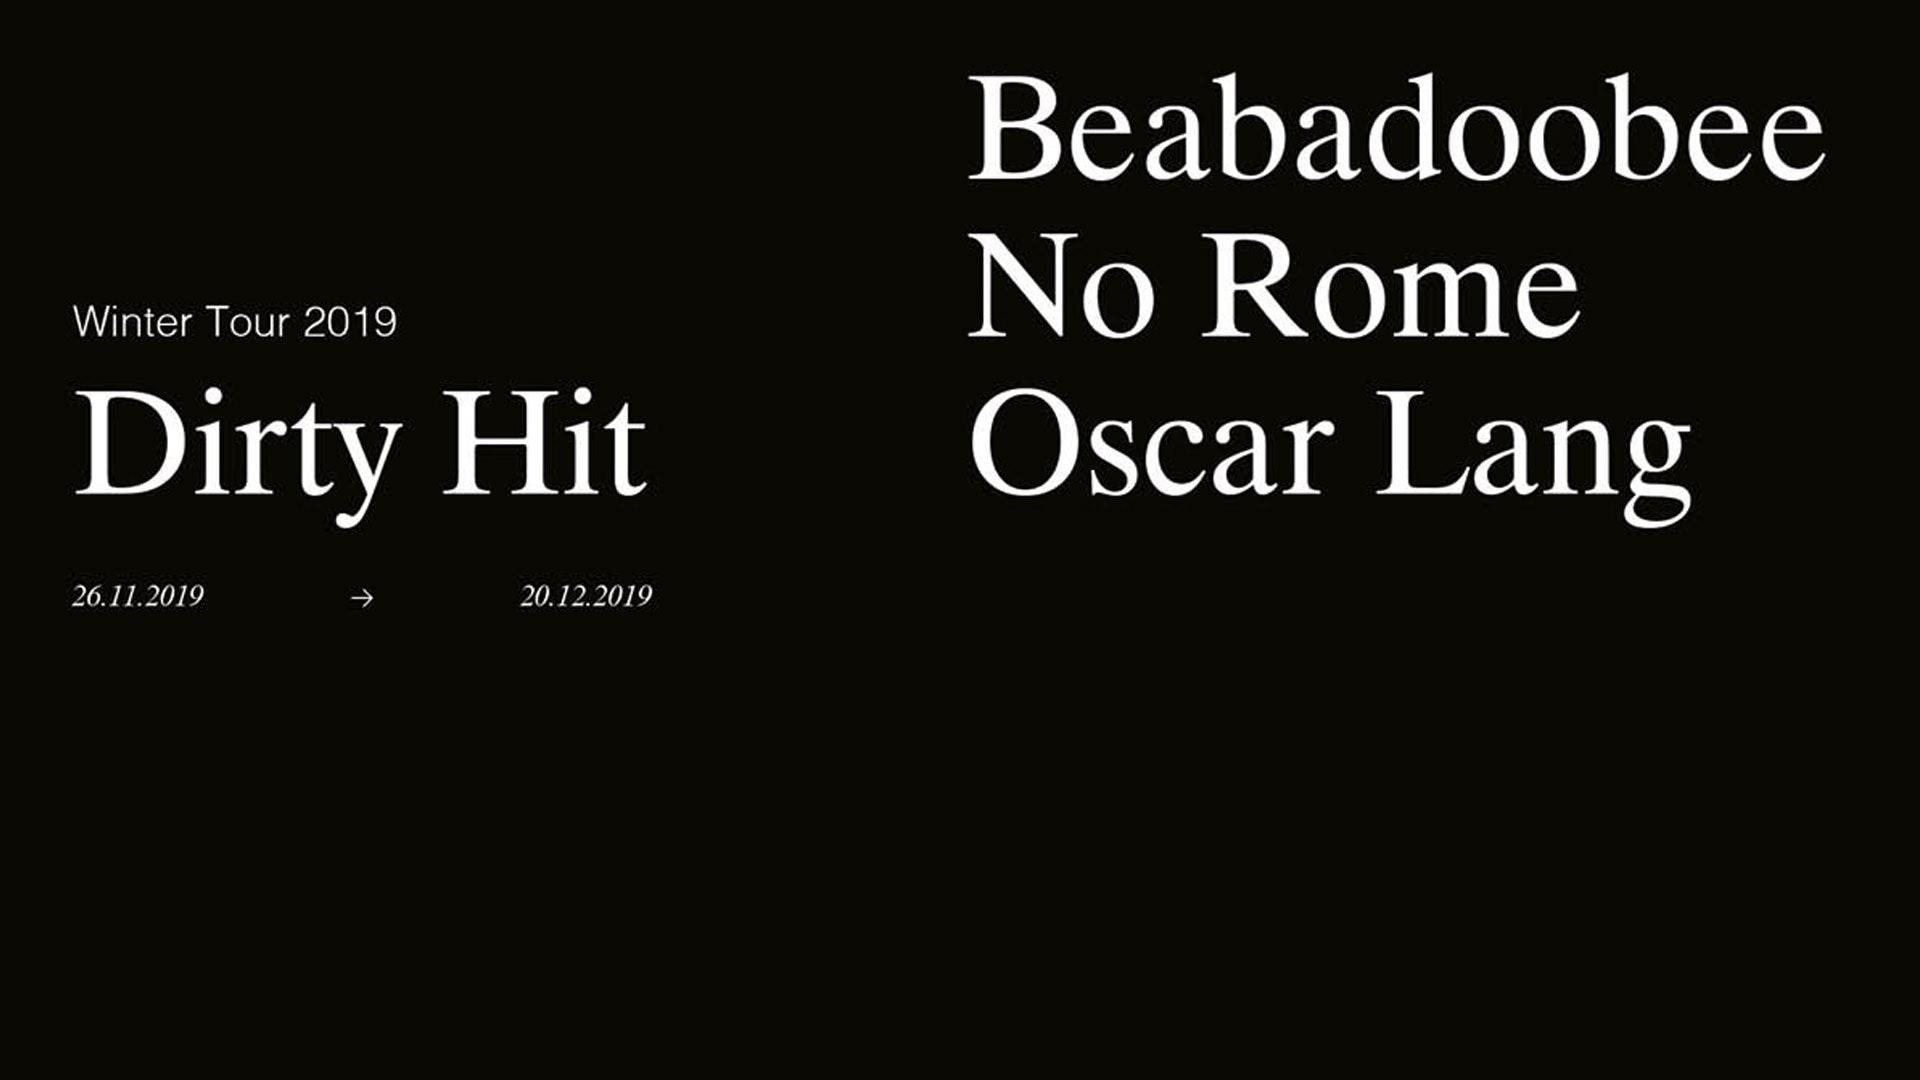 Dirty Hit Tour presents Beabadoobee, No Rome & Oscar Lang